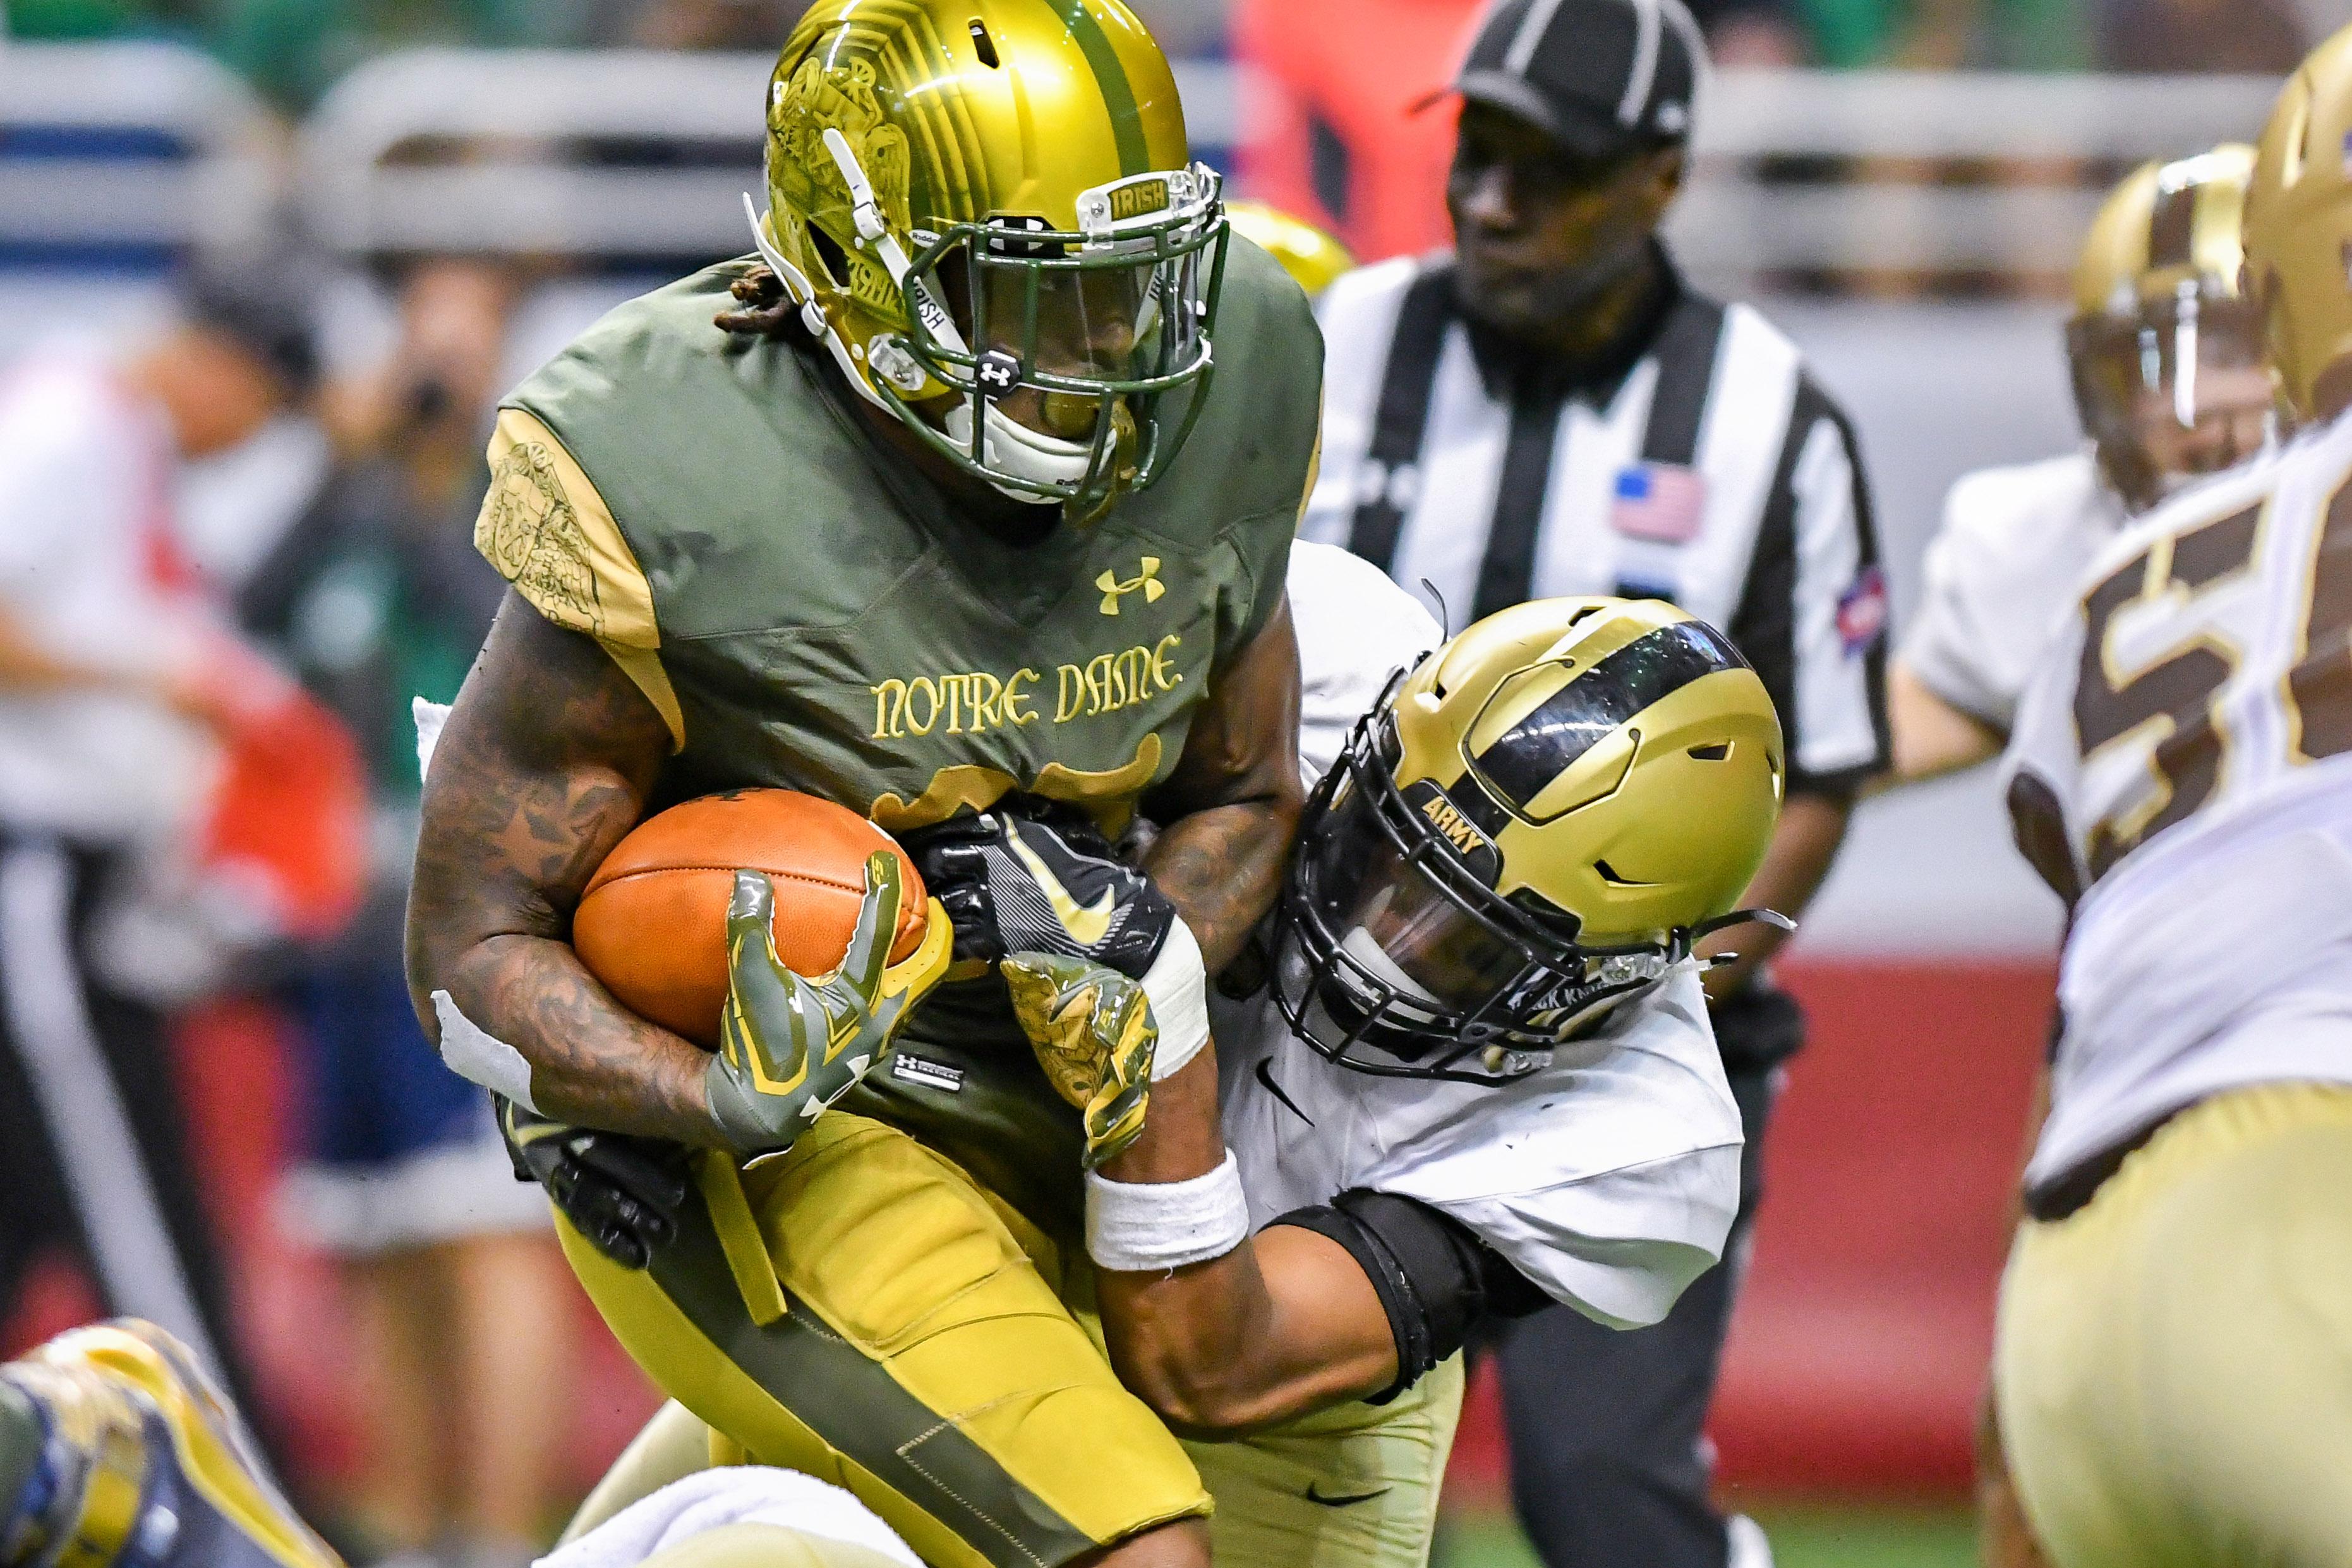 NCAA Football: Notre Dame vs Army